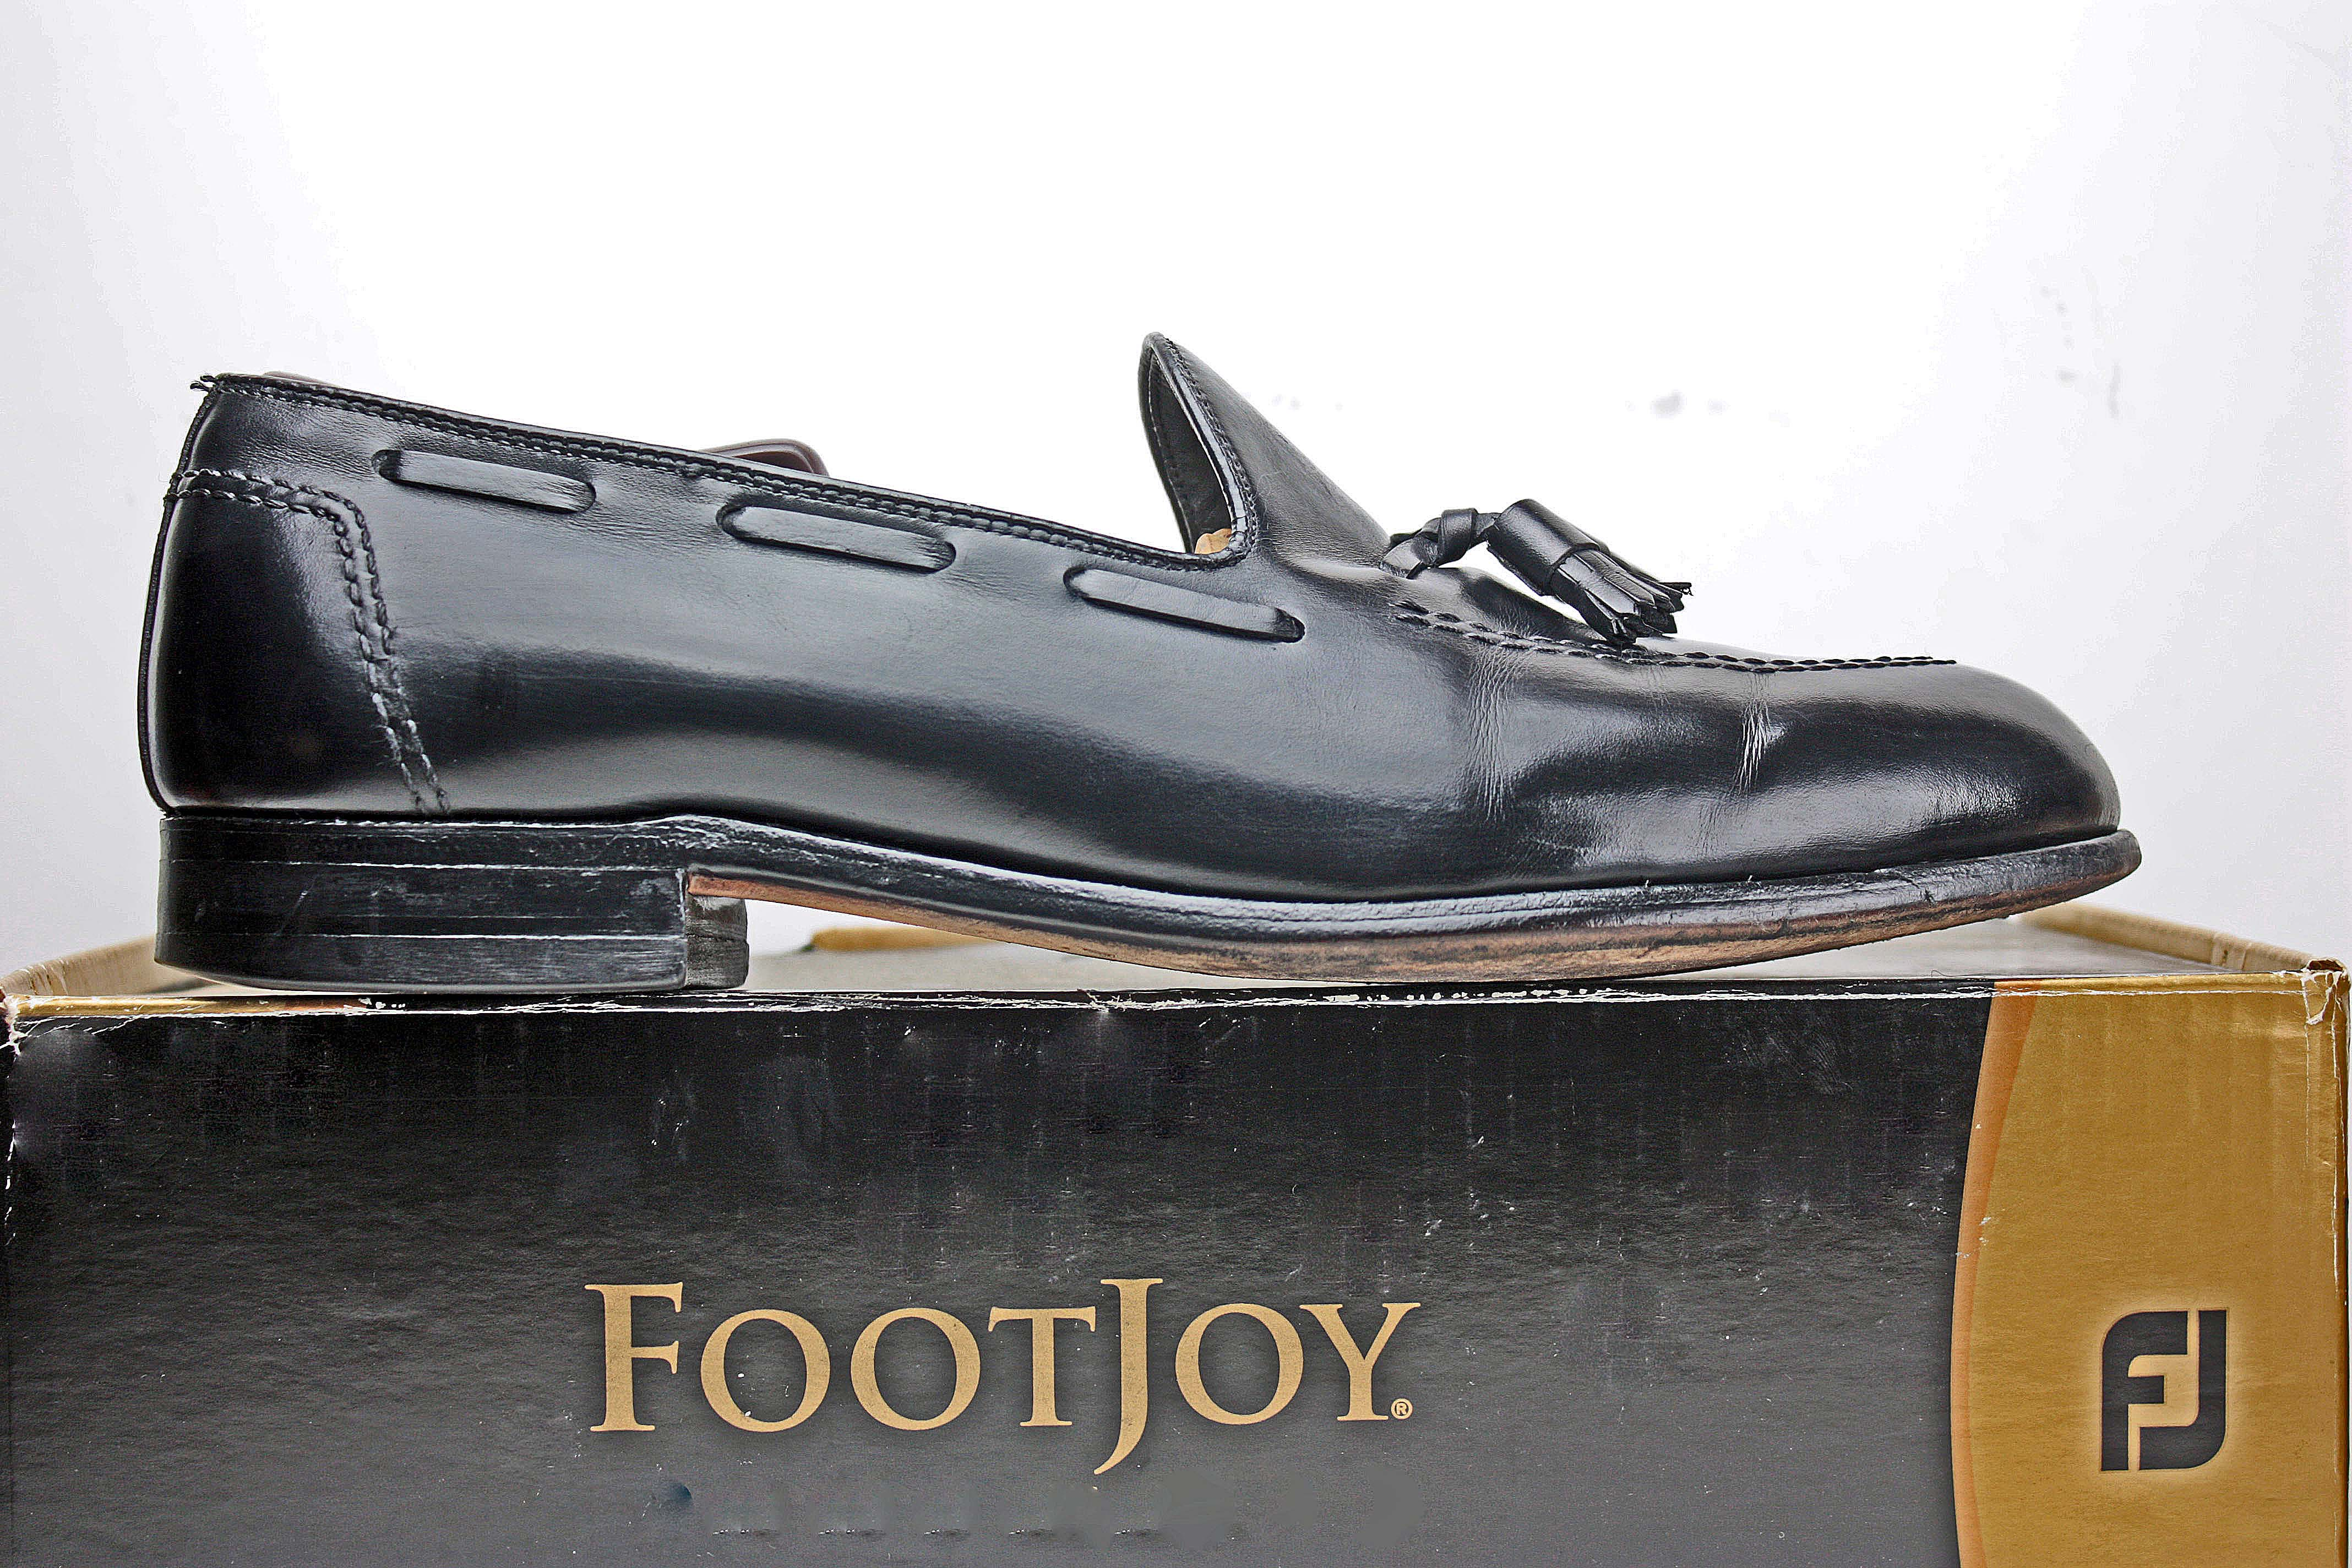 b2595daf206 Footjoy Footjoy Classics Mens Loafers Size 11.5 C Black Leather ...